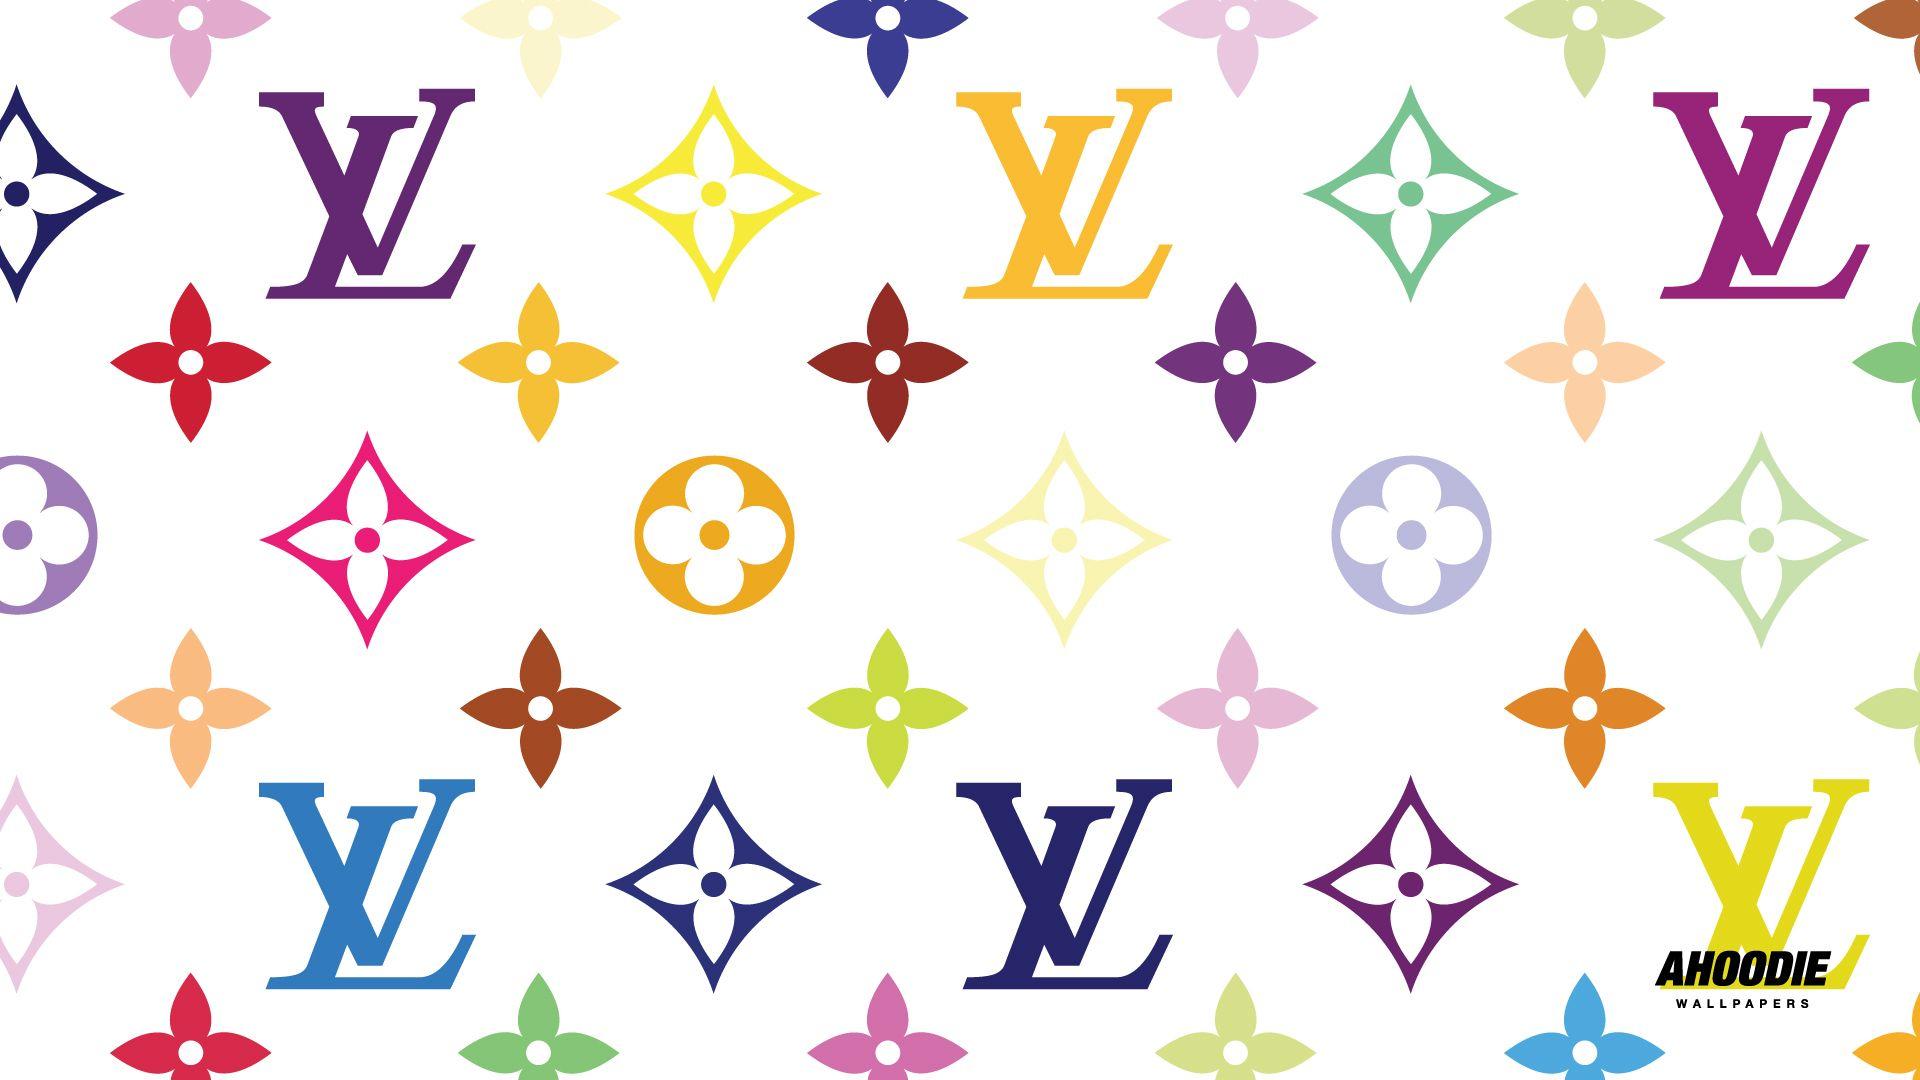 Lv Google Search Monogram Wallpaper Louis Vuitton Background Louis Vuitton Pattern